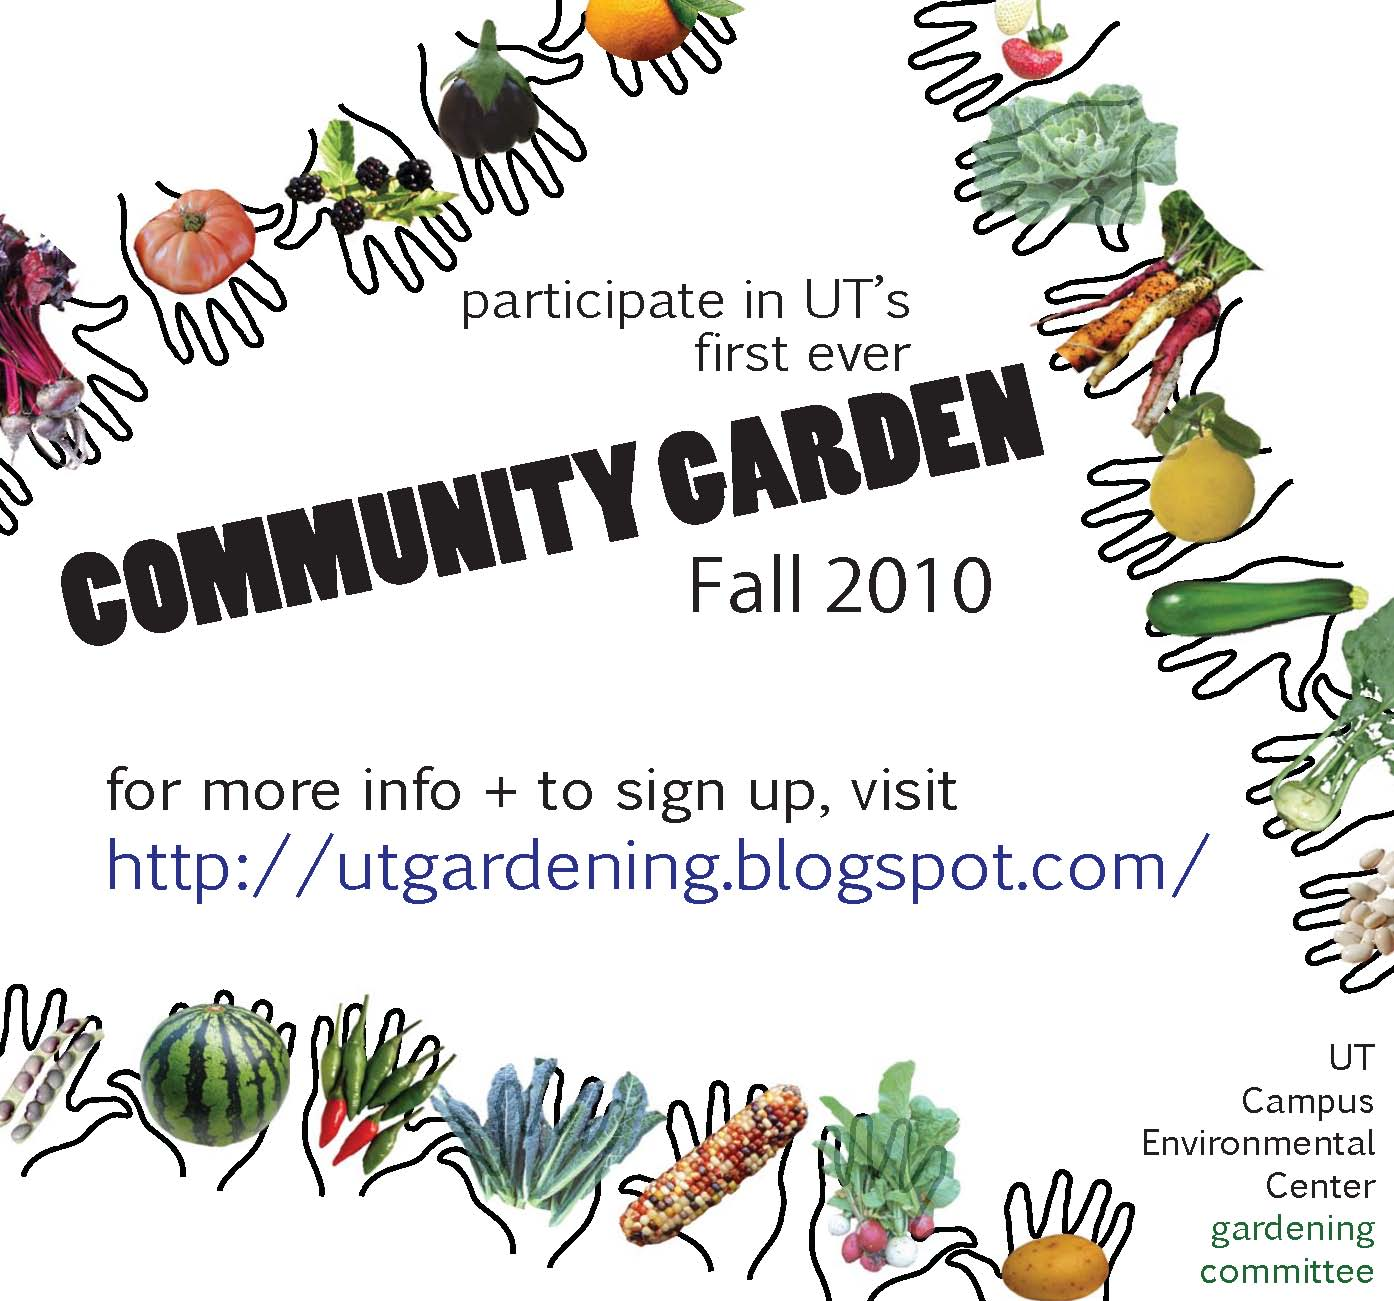 UT Gardening Committee first community garden workday